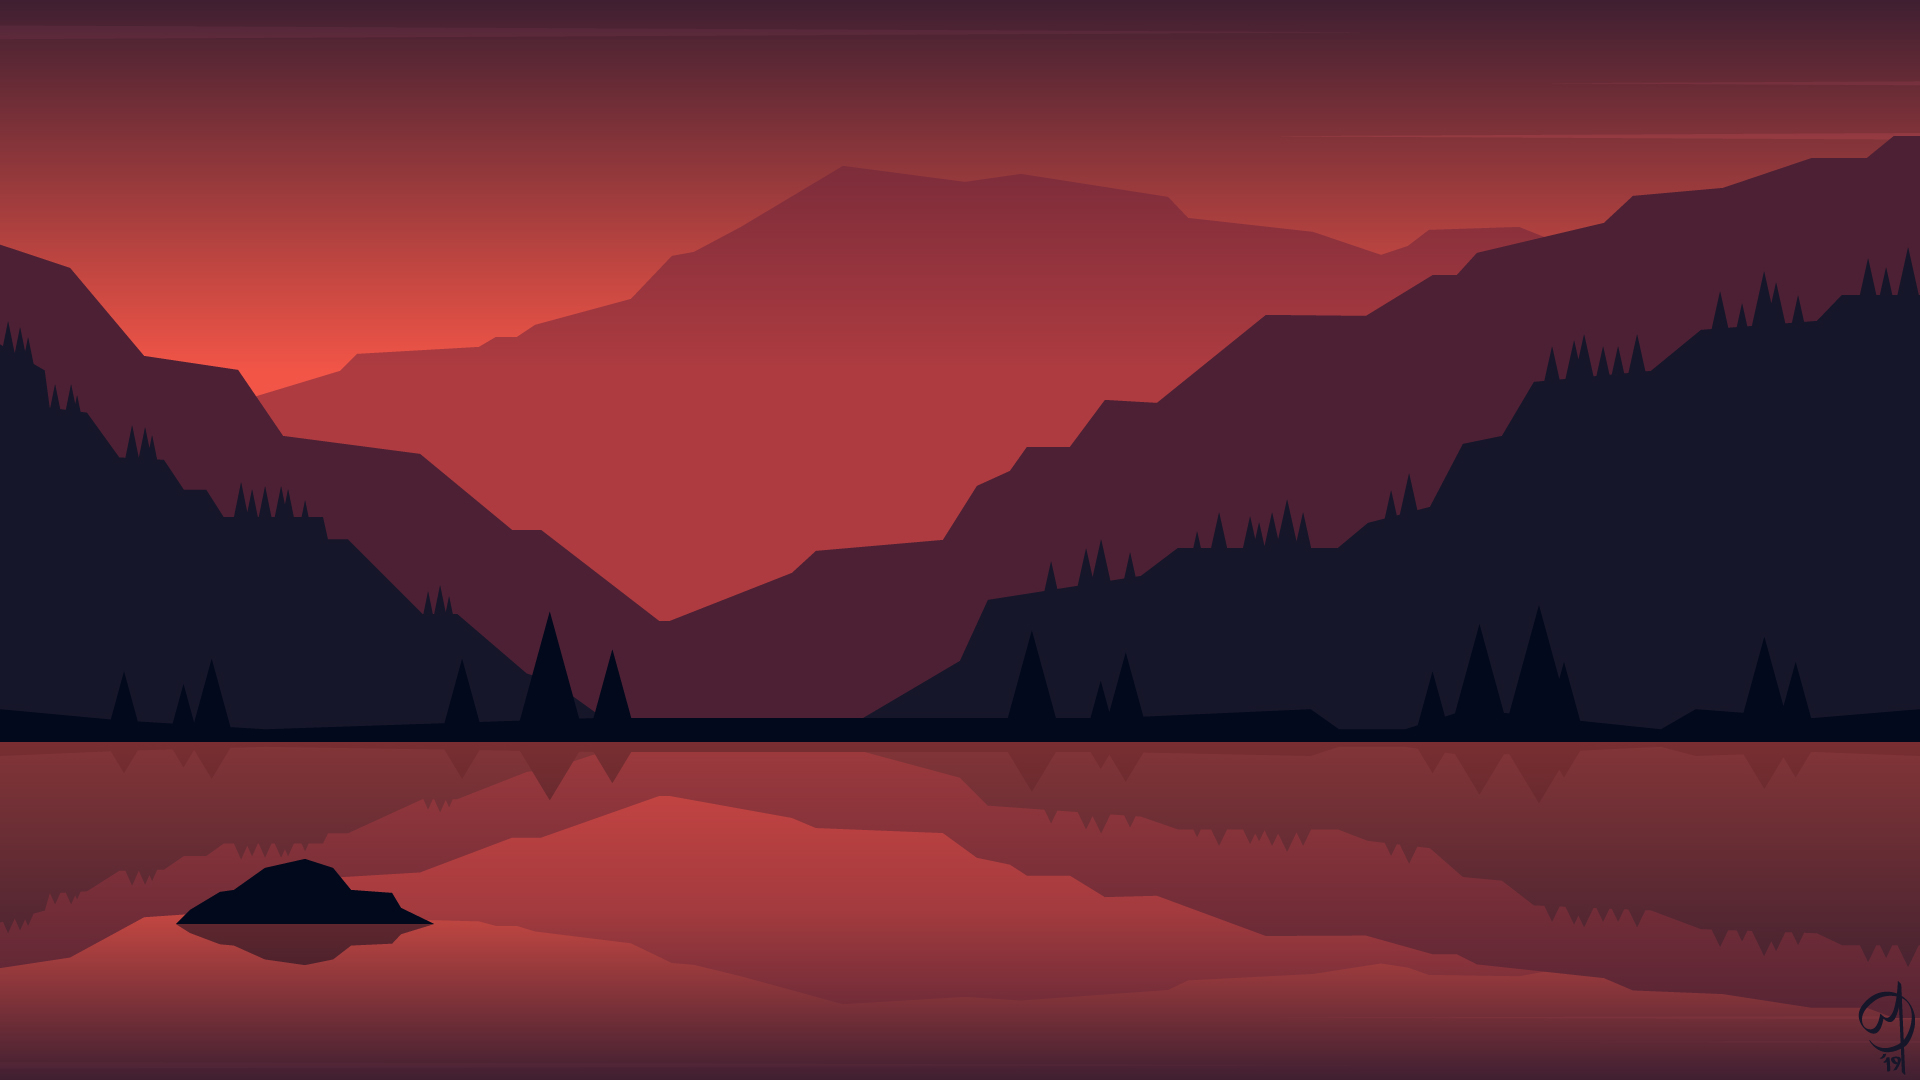 1920x1080 Minimalist Landscape Painting 1080p Laptop Full Hd